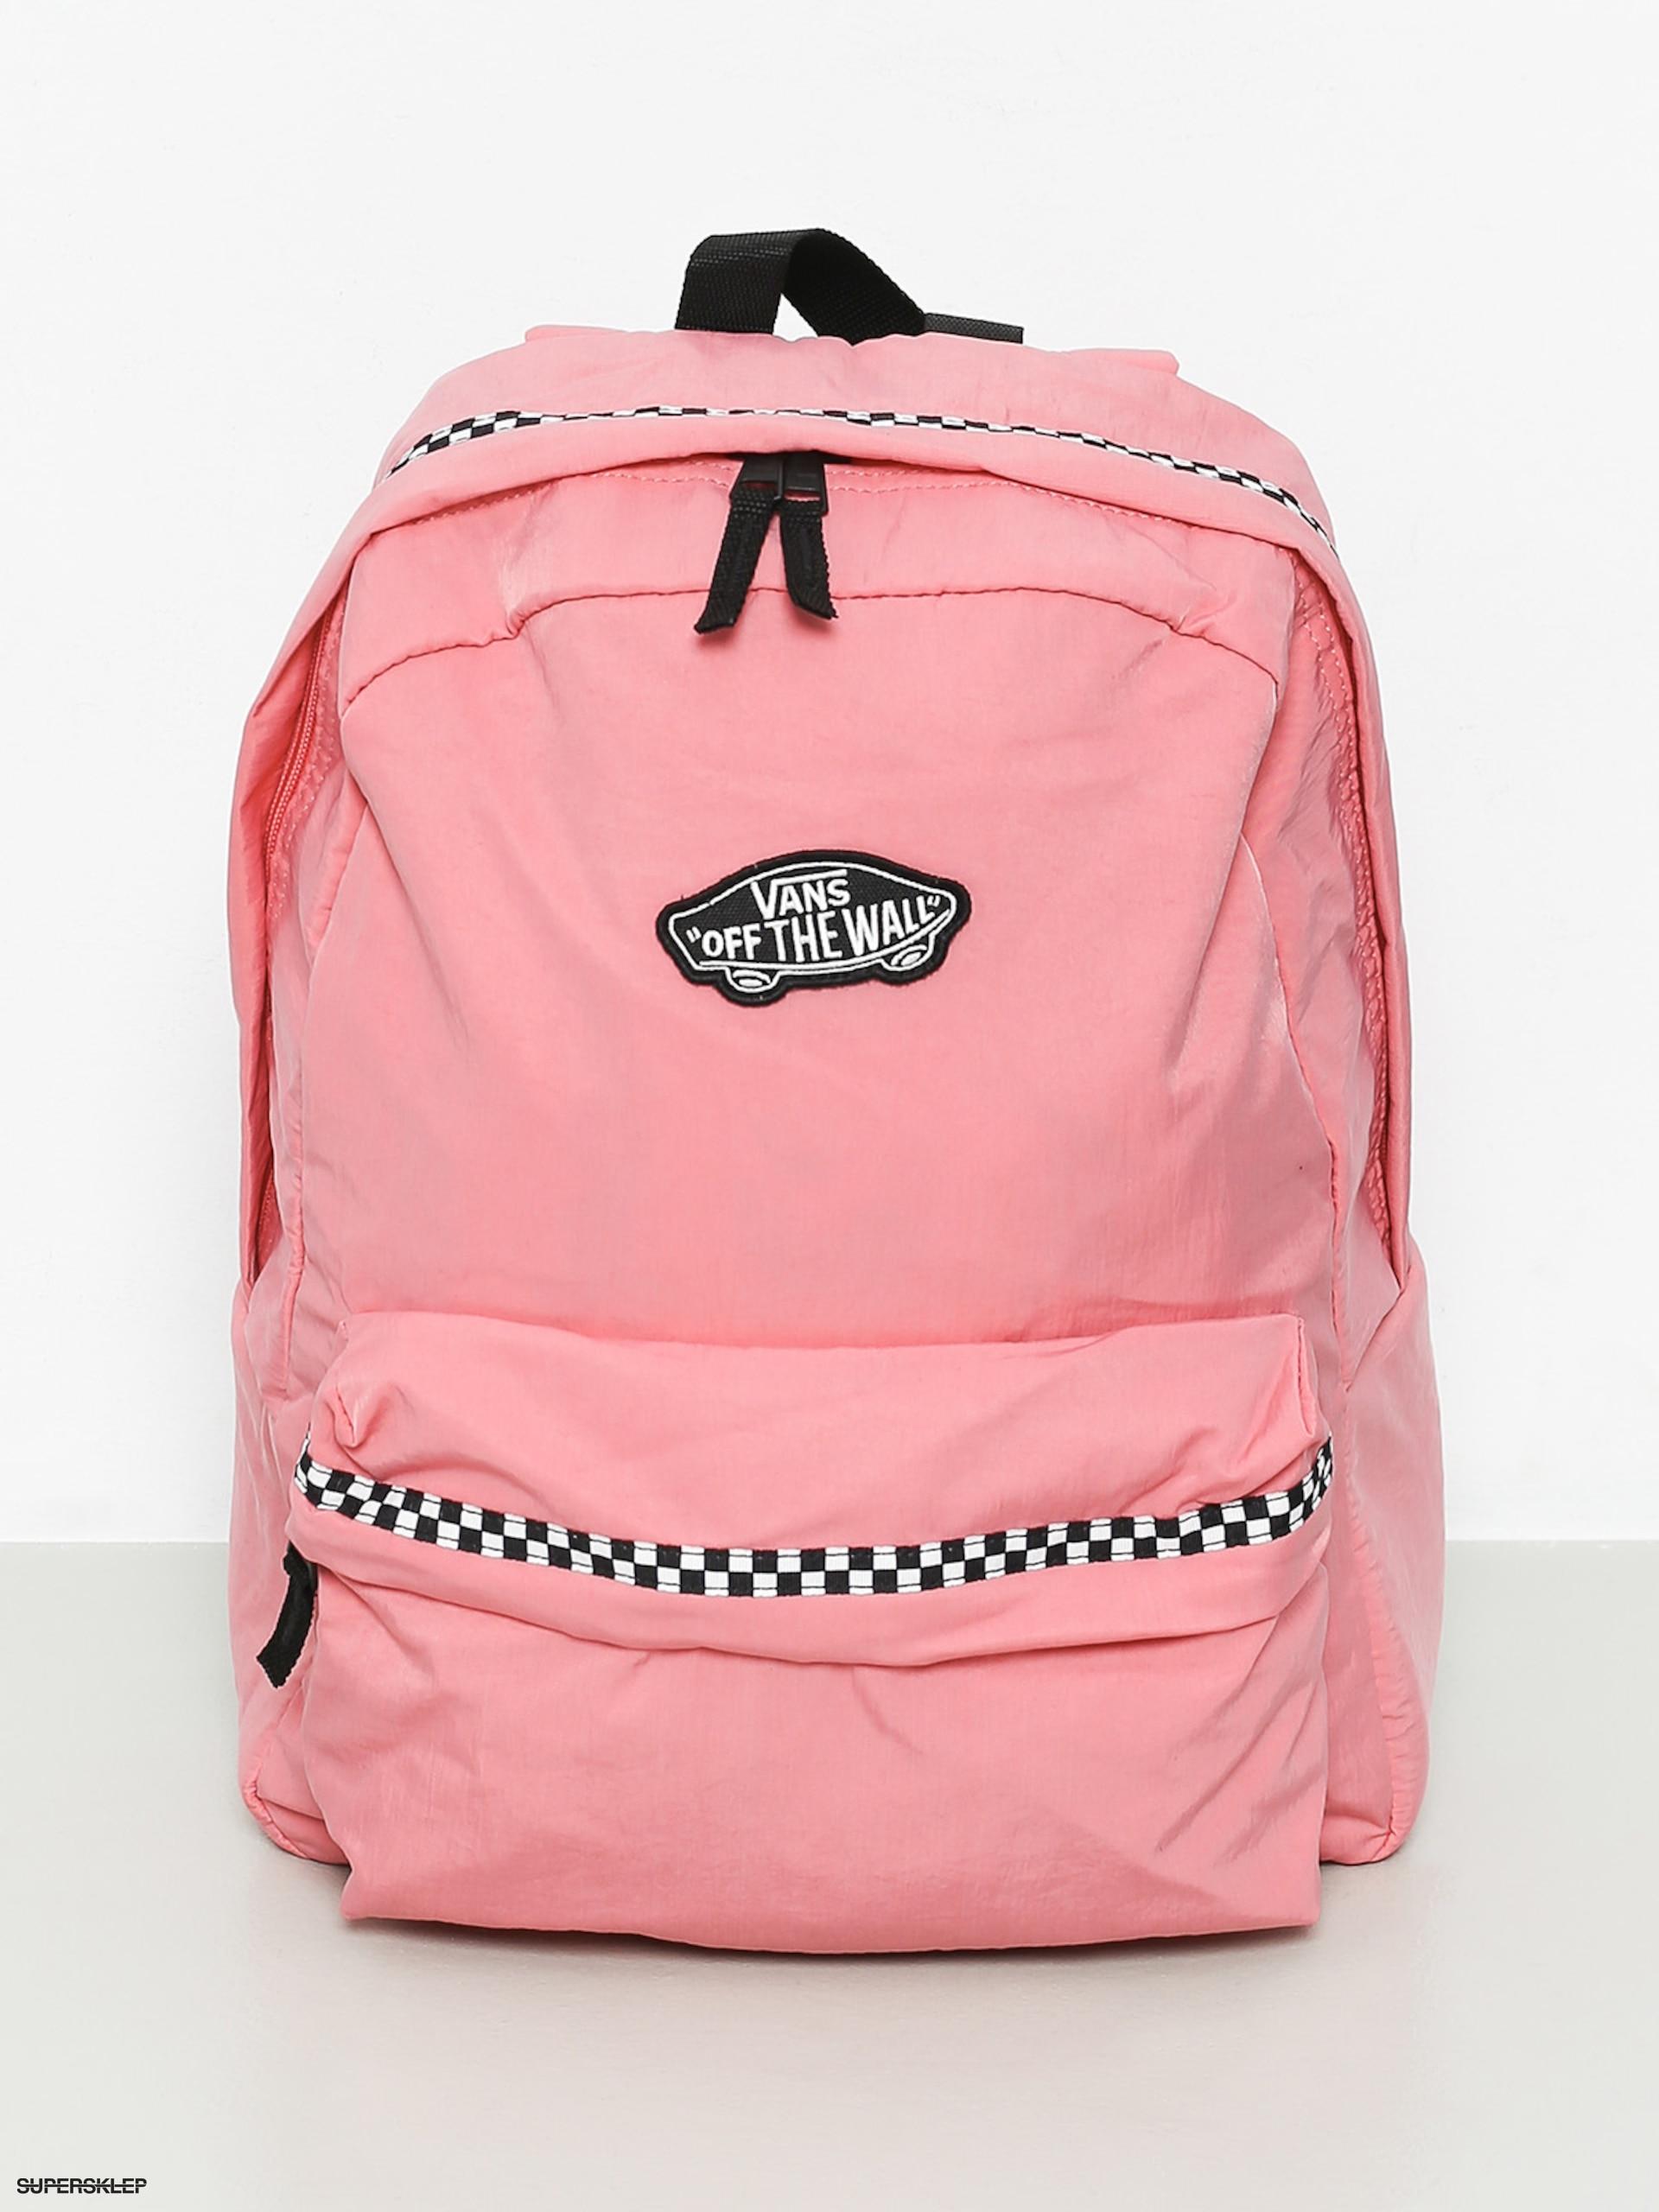 5b12c0d0d31eb Plecak Vans Expedition II Wmn (strawberry pink microcheck)